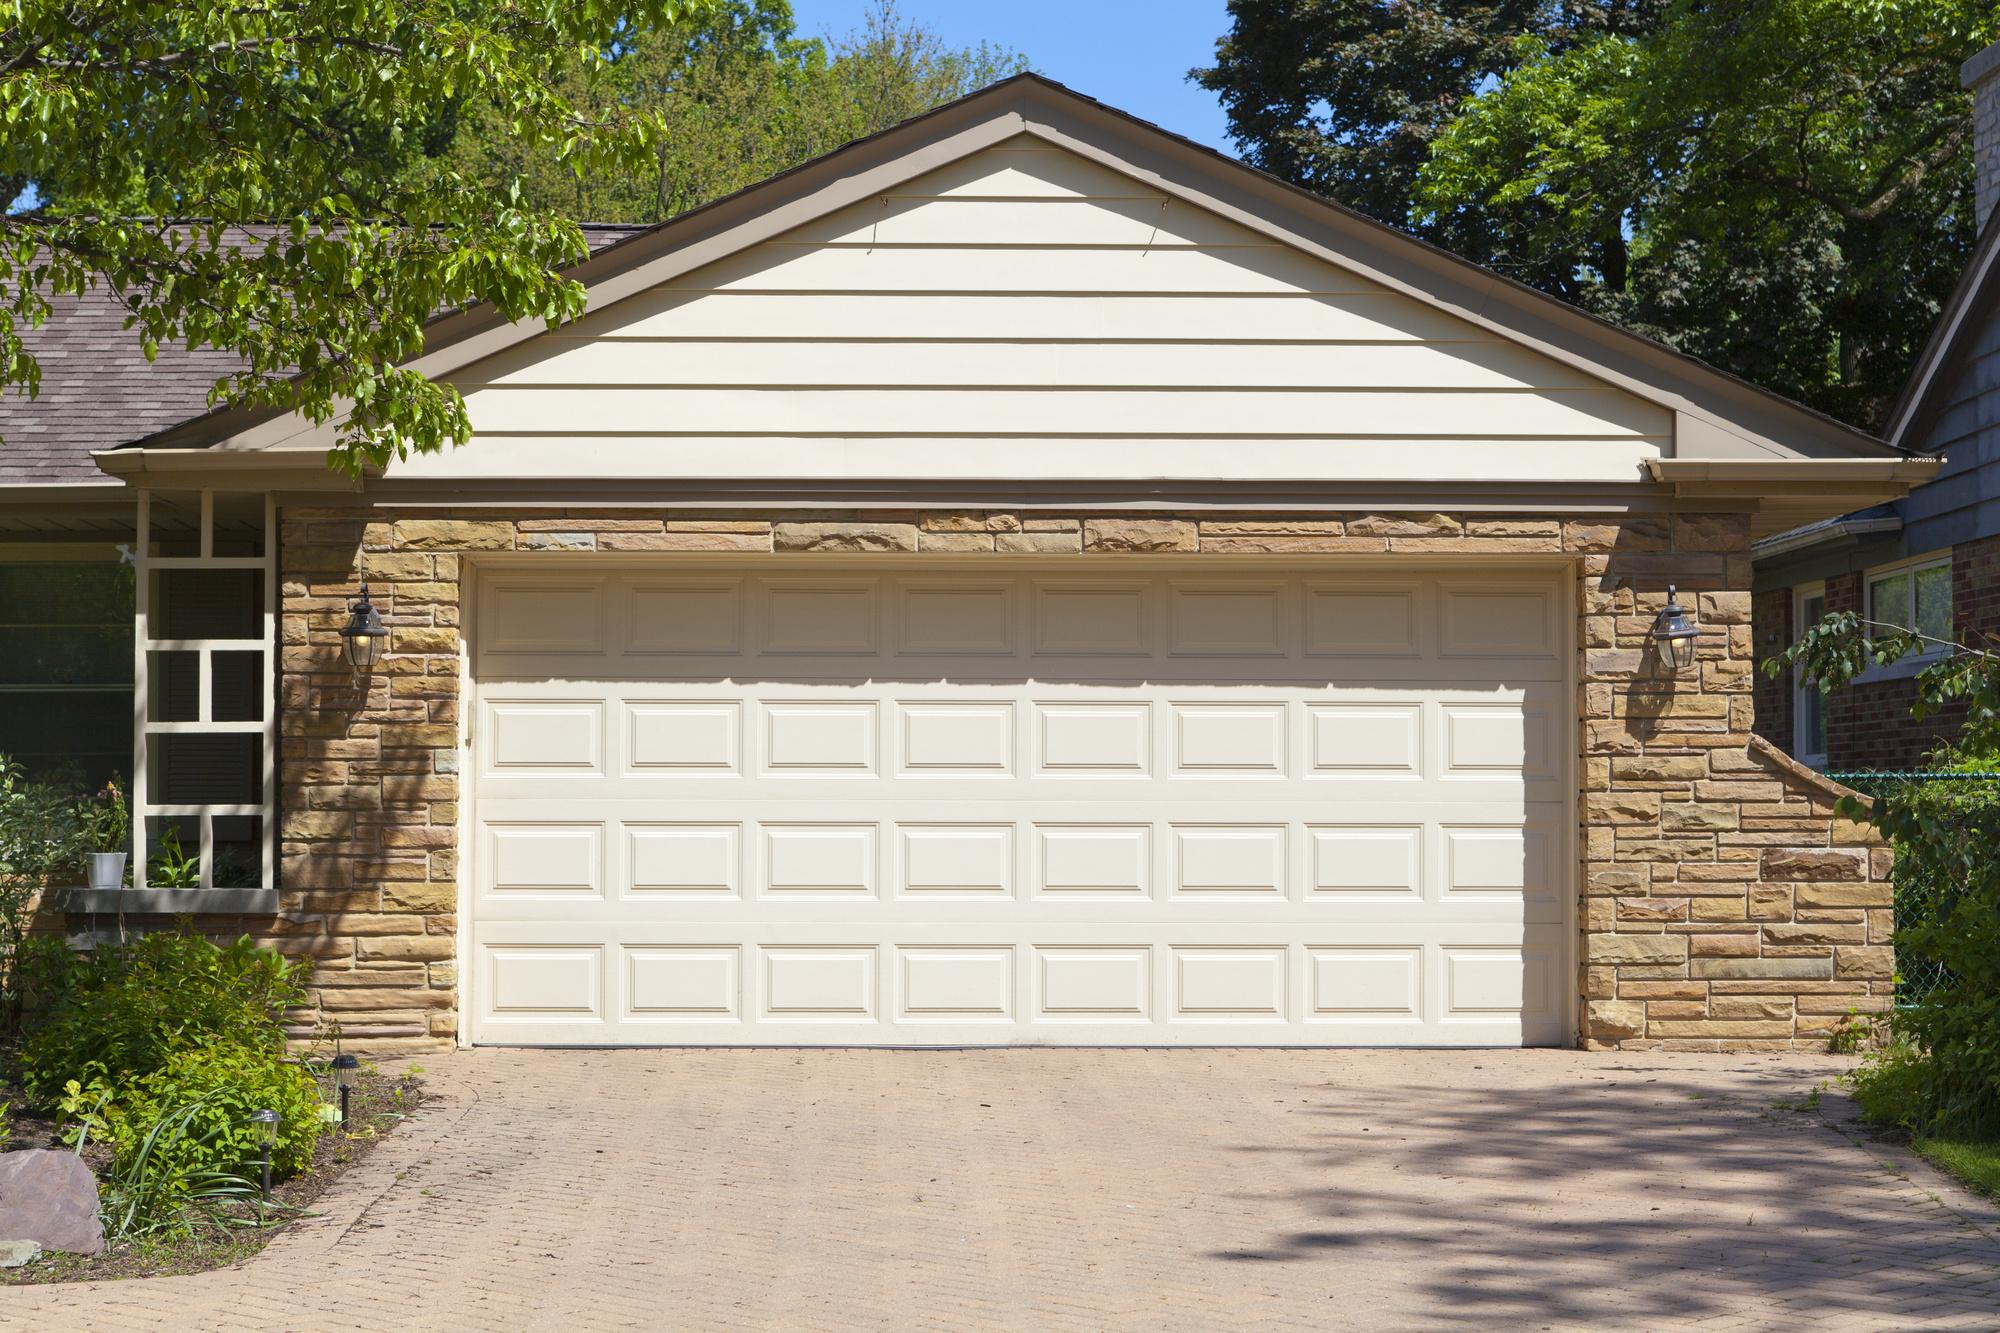 5 signs you need a new garage door in fort worth solutioingenieria Gallery